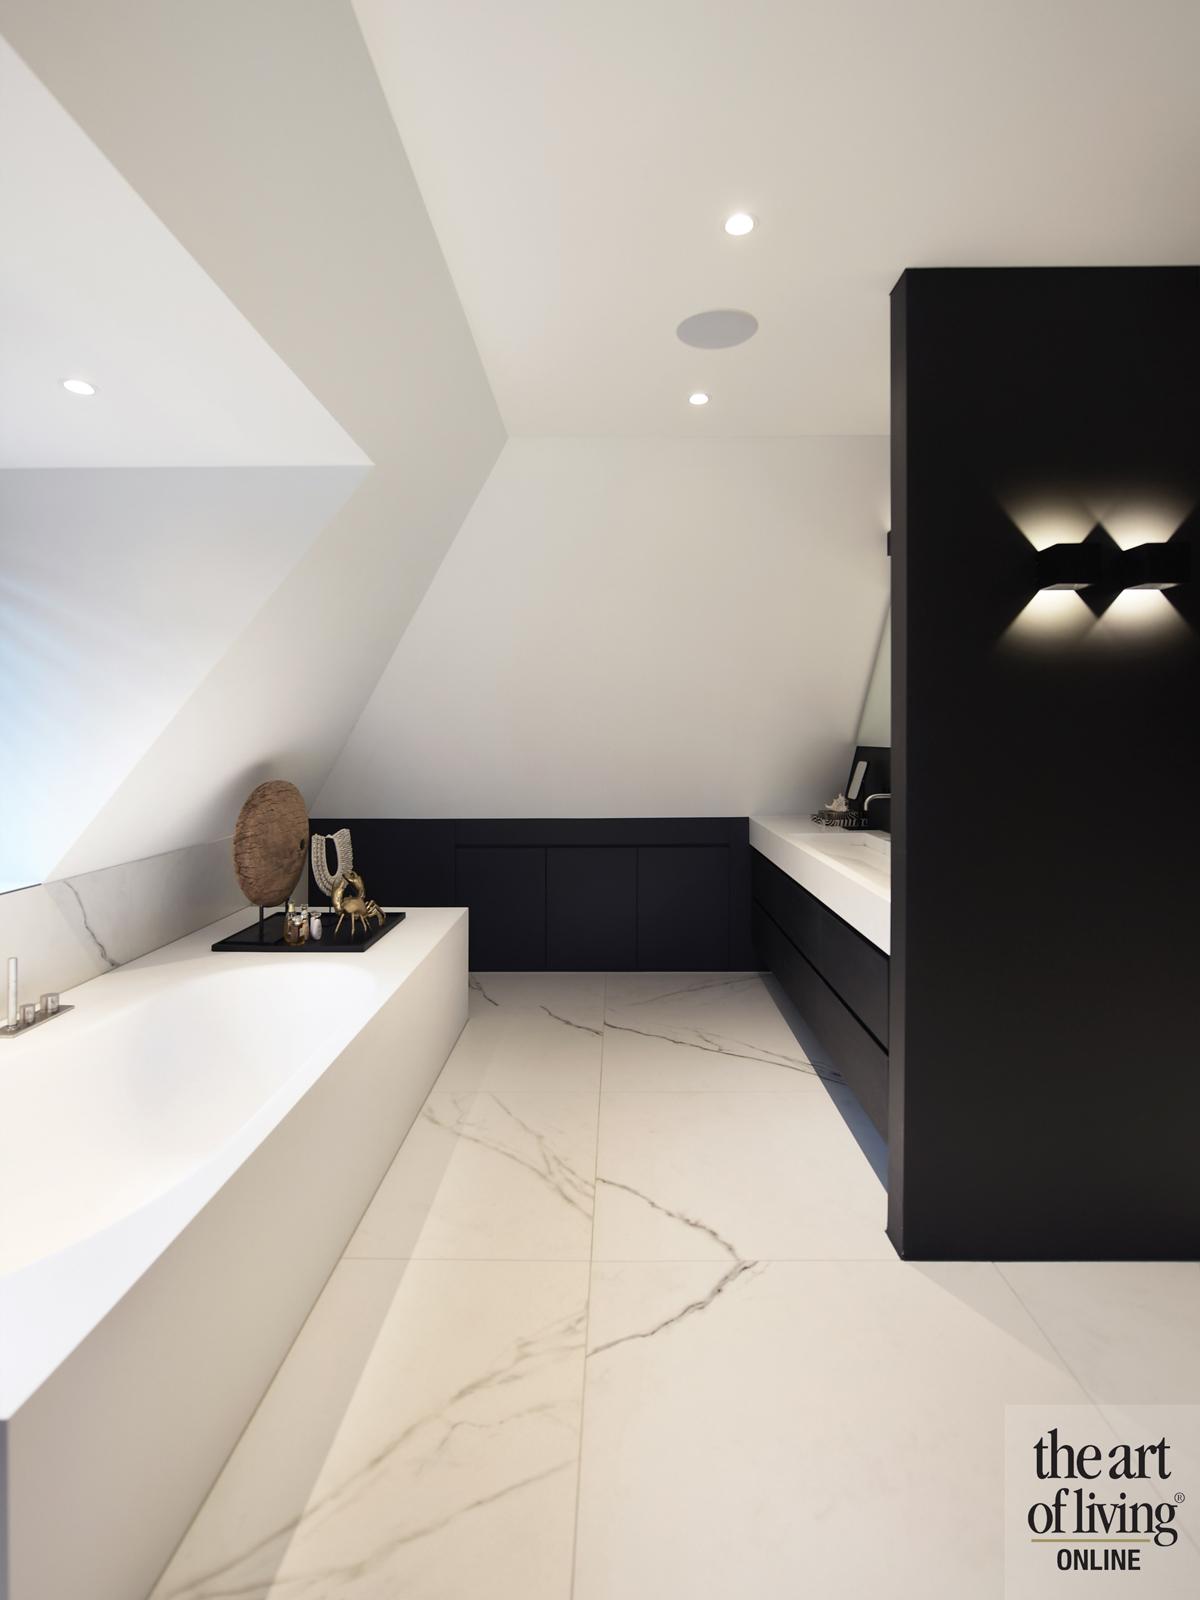 Licht interieur   Label 31, the art of living